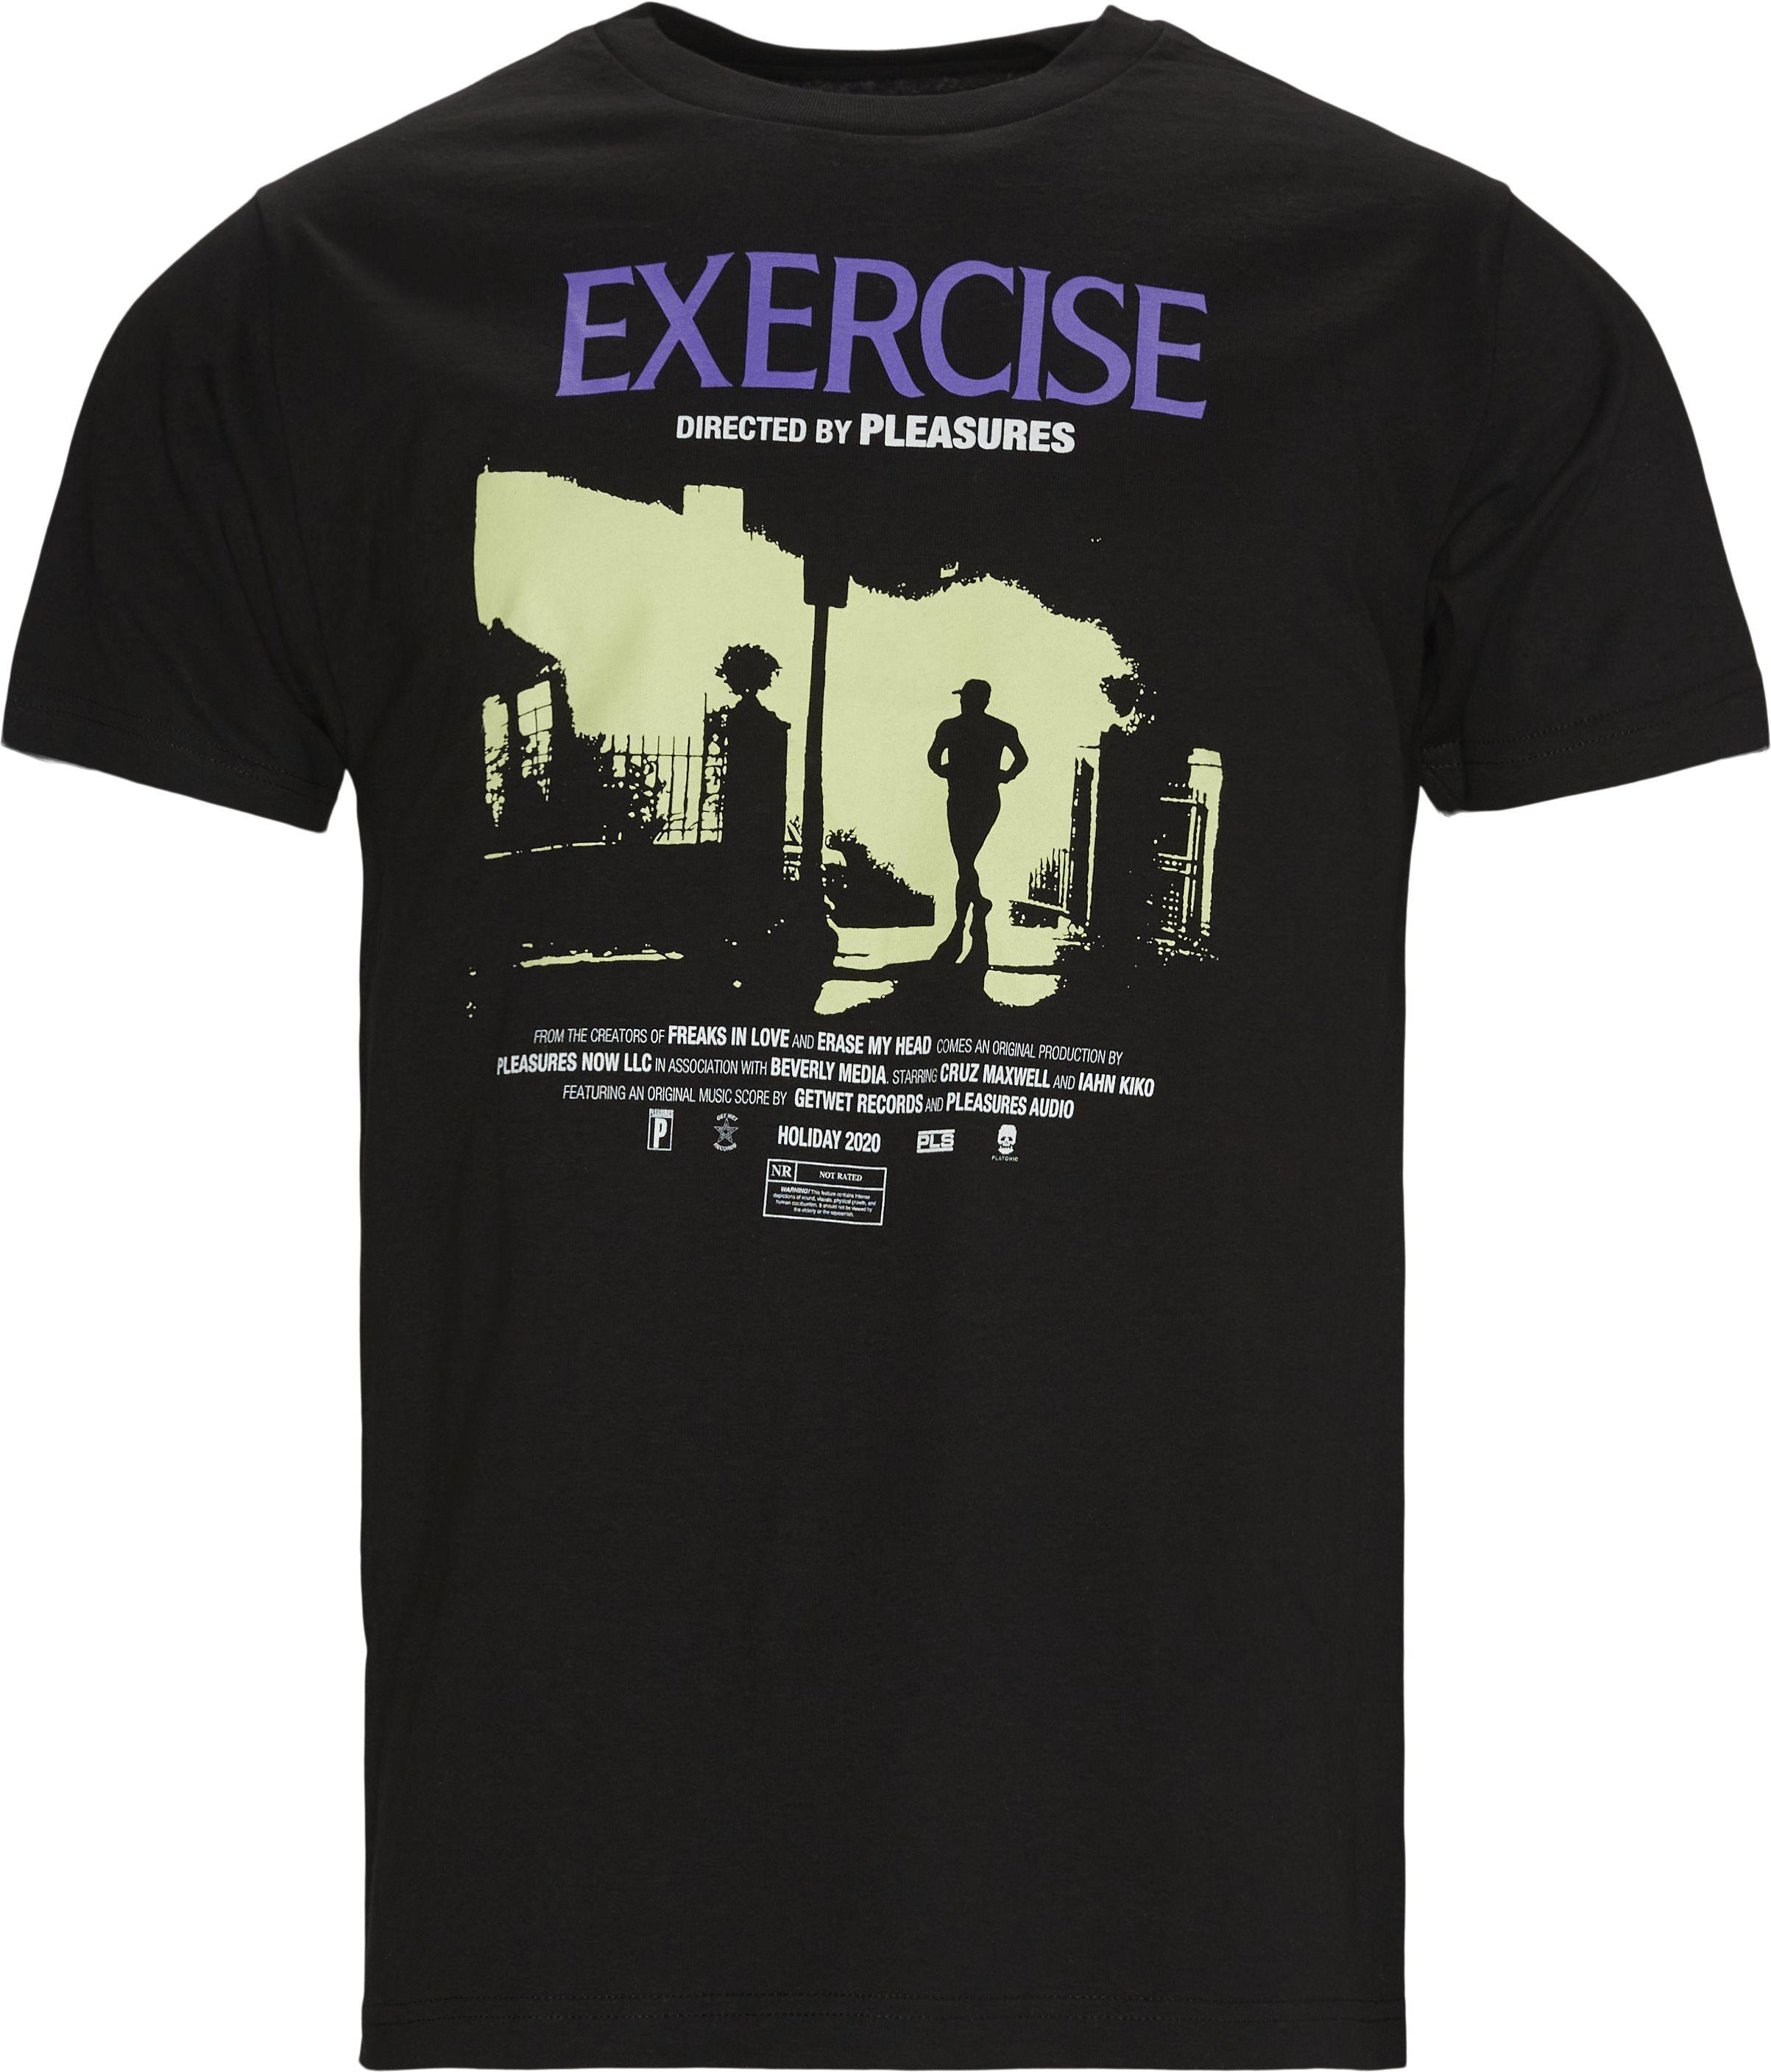 Exercise Tee - T-shirts - Regular - Svart